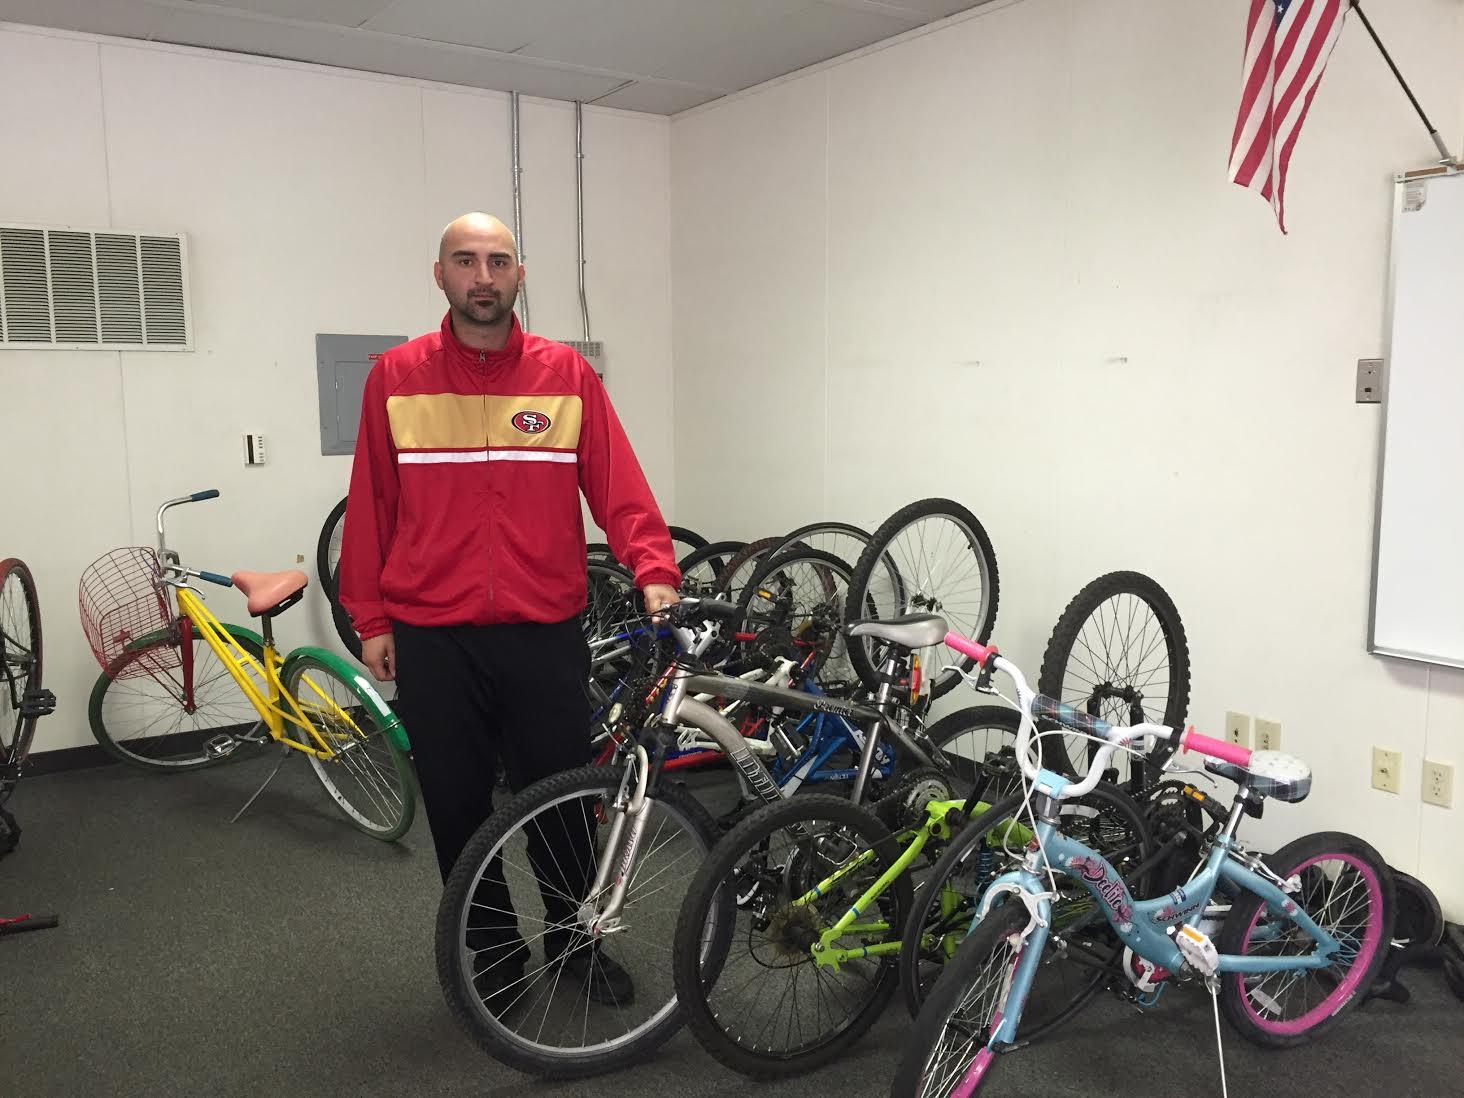 Campus supervisor, Bike Club repair bikes to donate